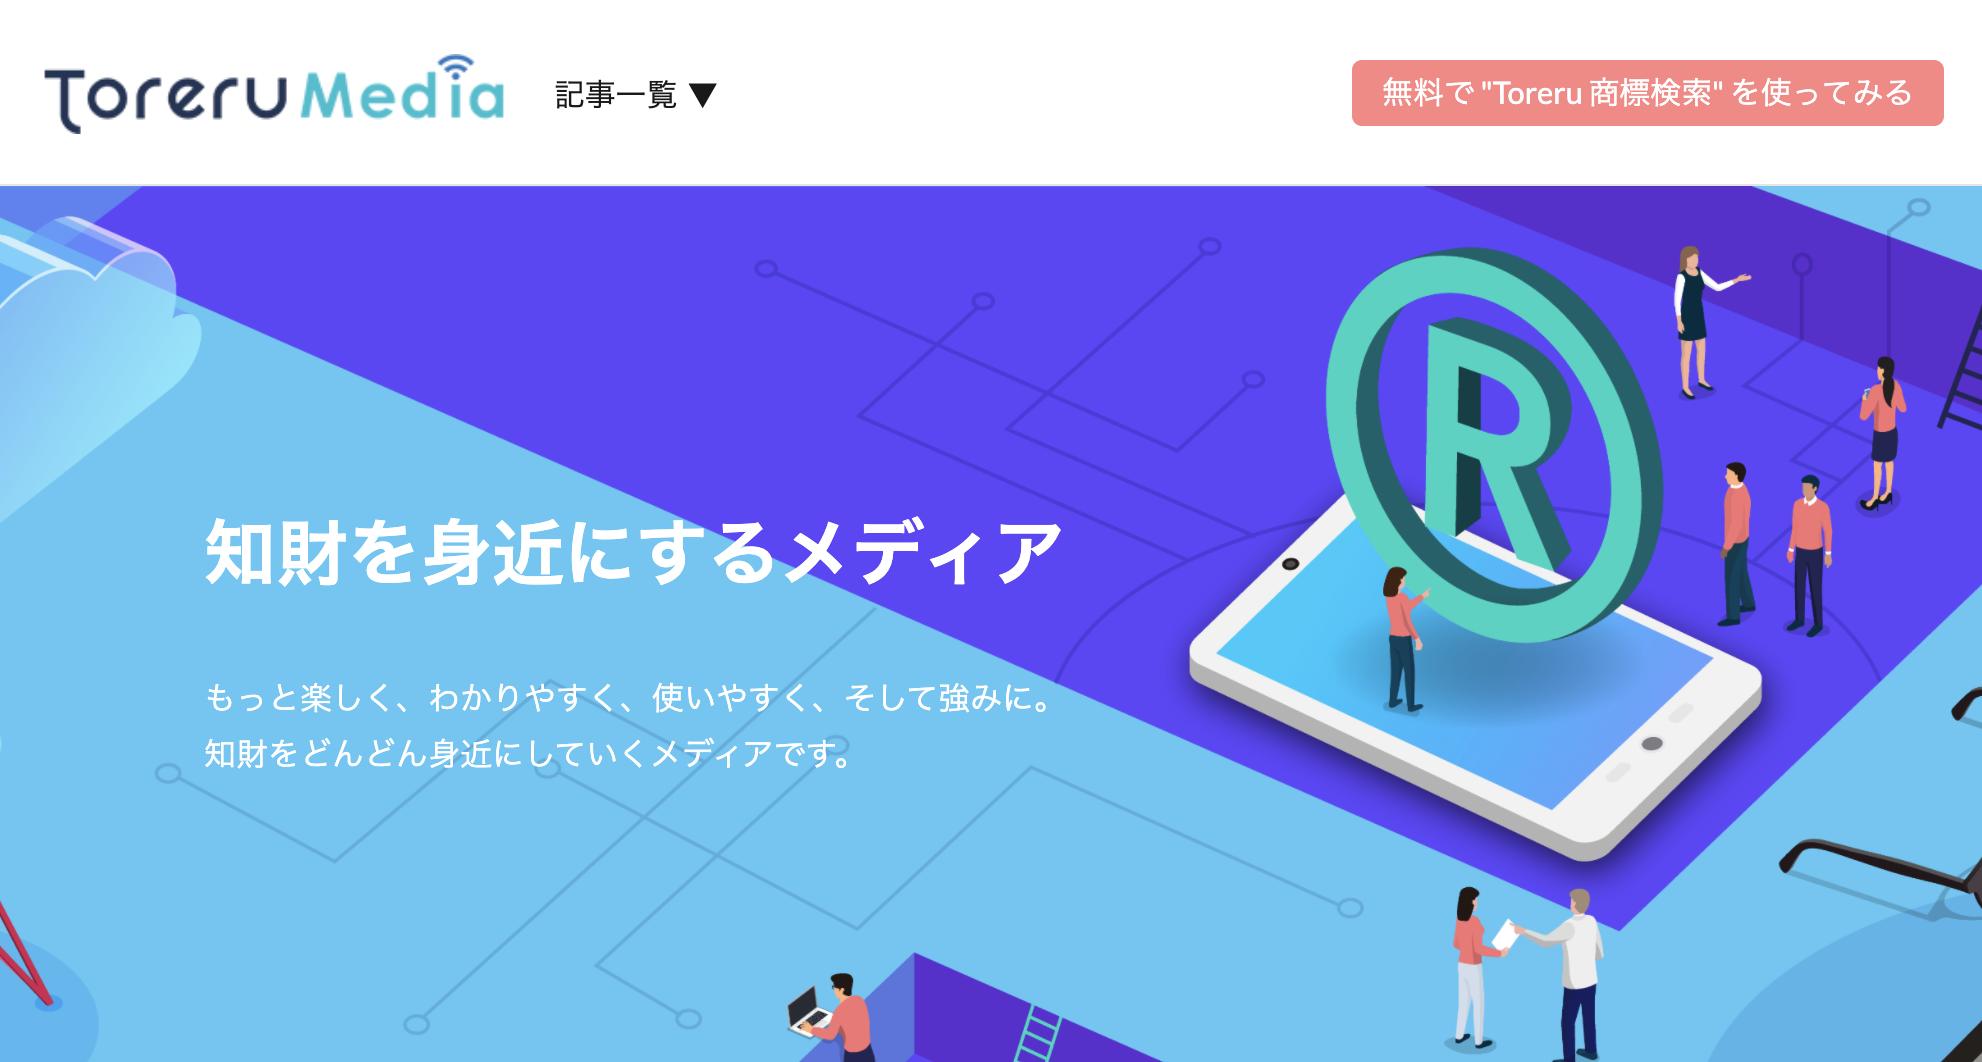 WordPress エンジニア募集!知財を身近にするWebメディア「Toreru Media」